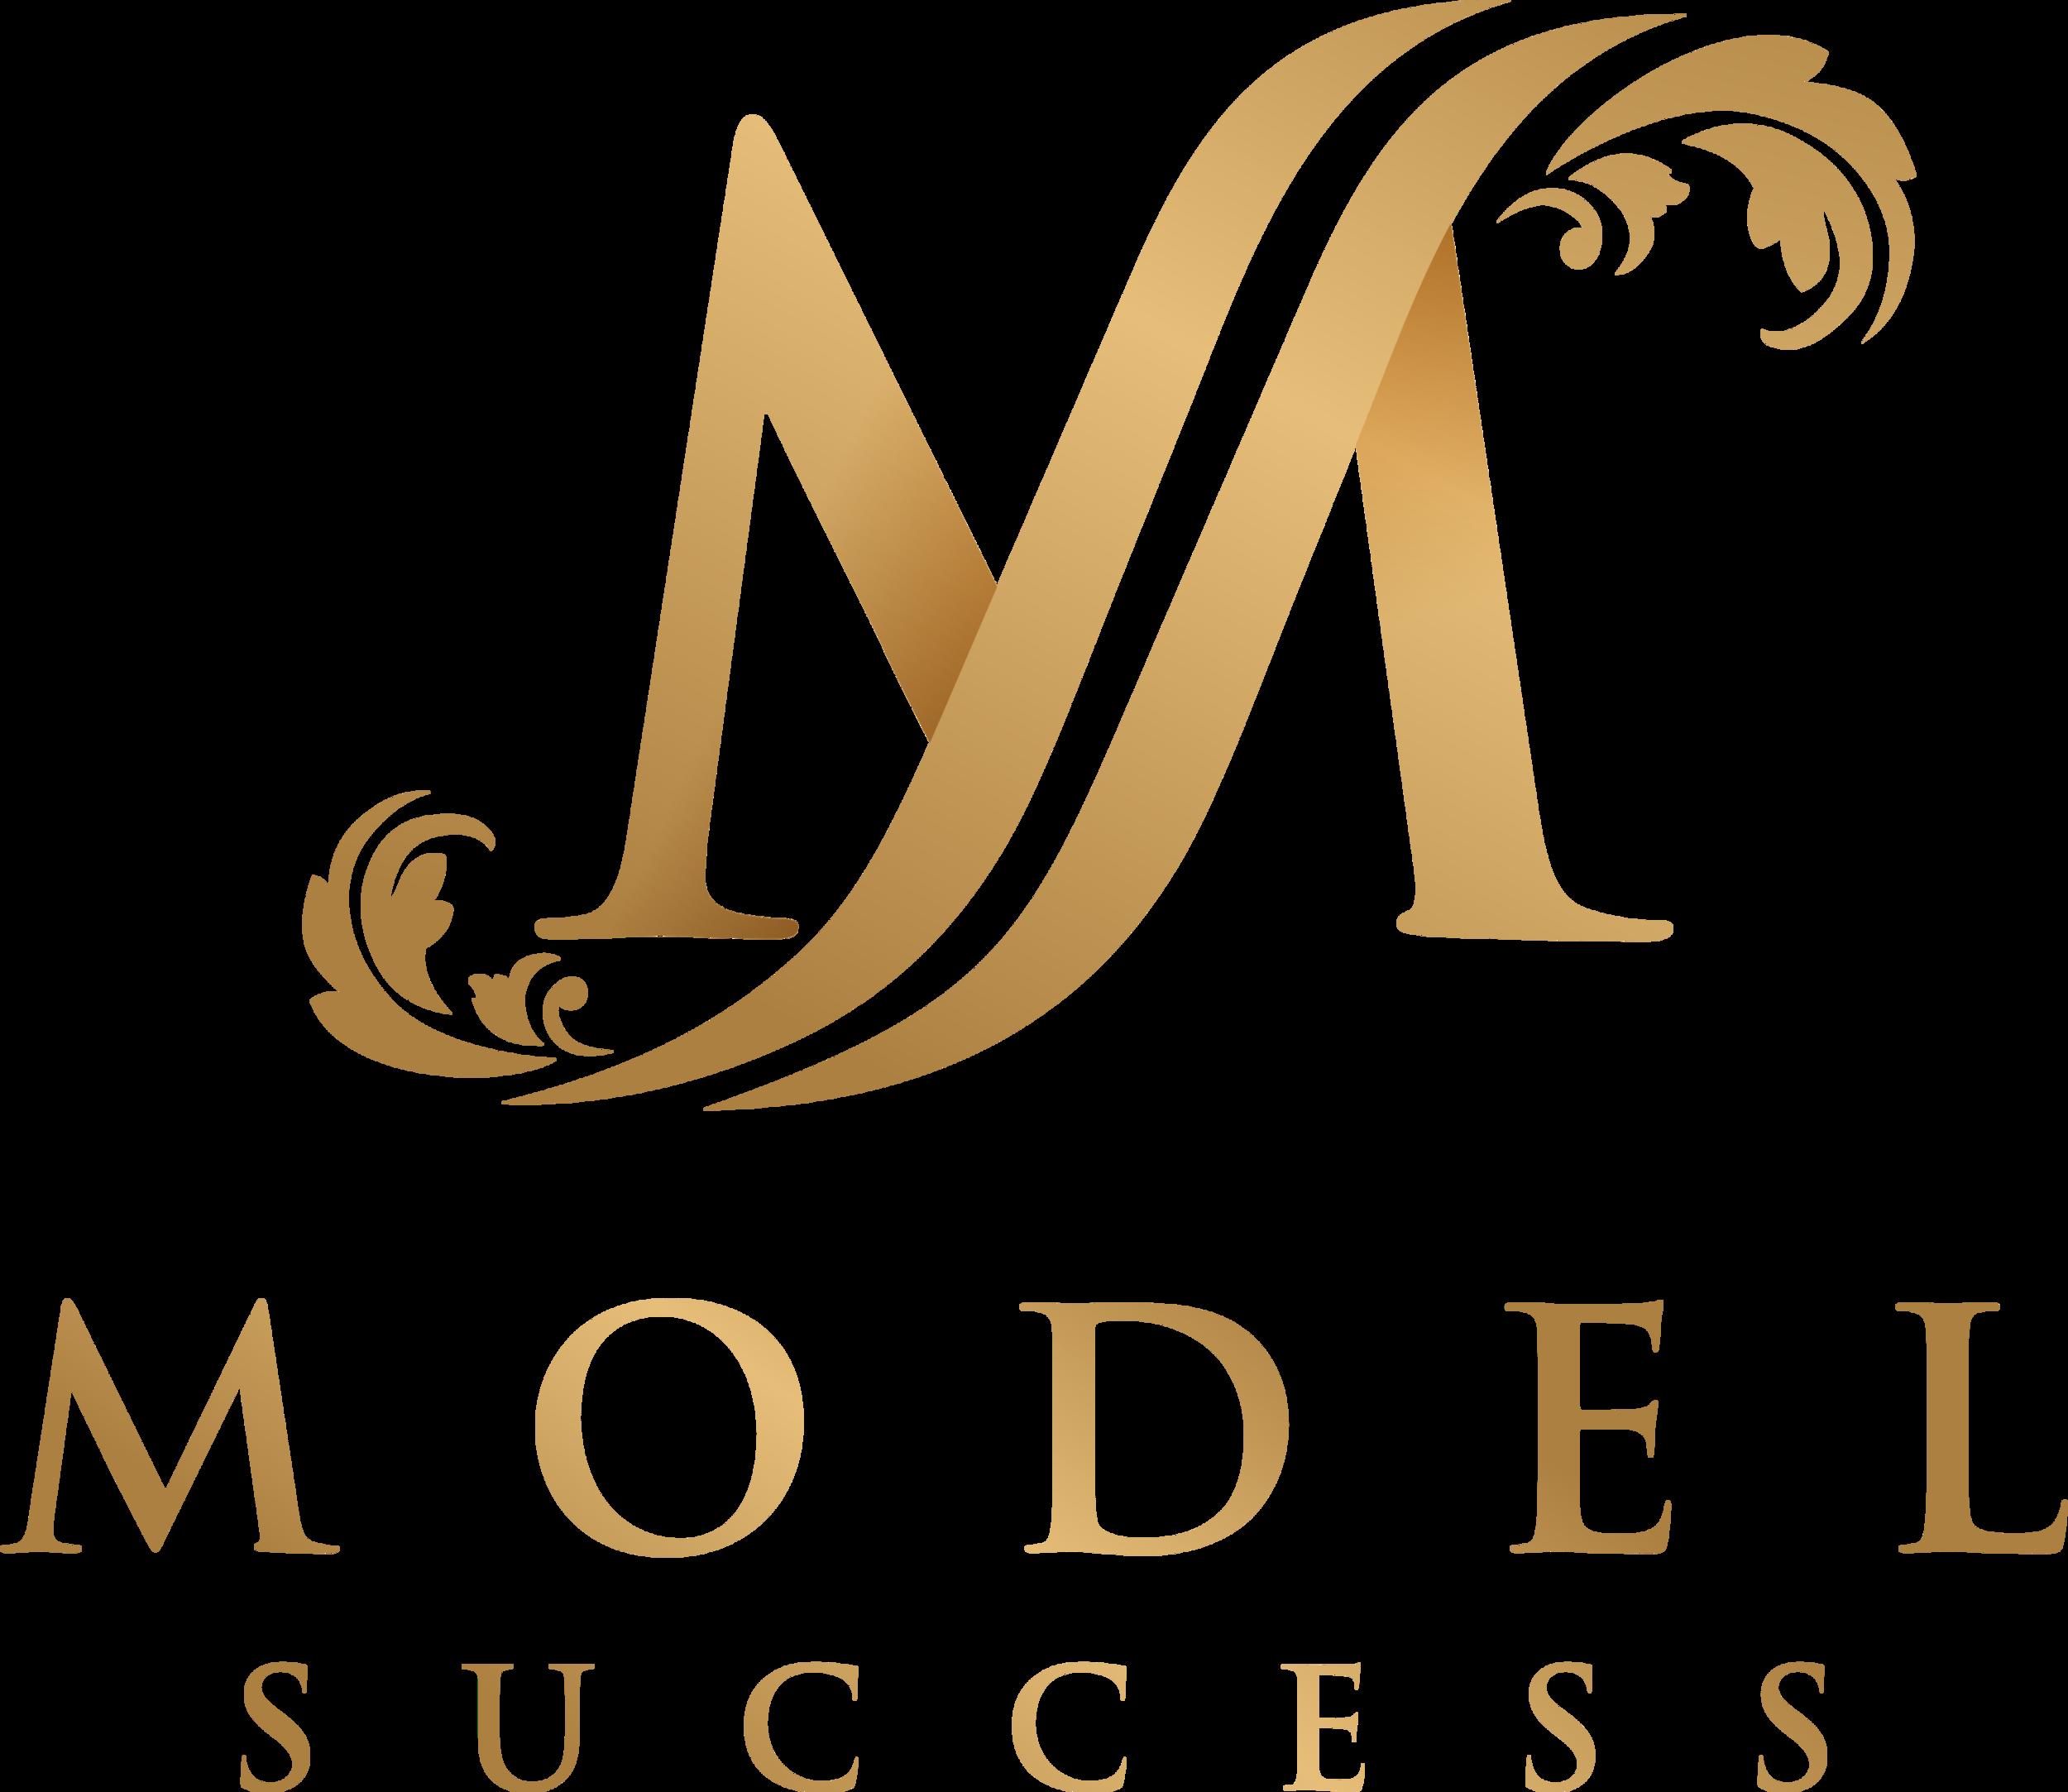 Model Succes